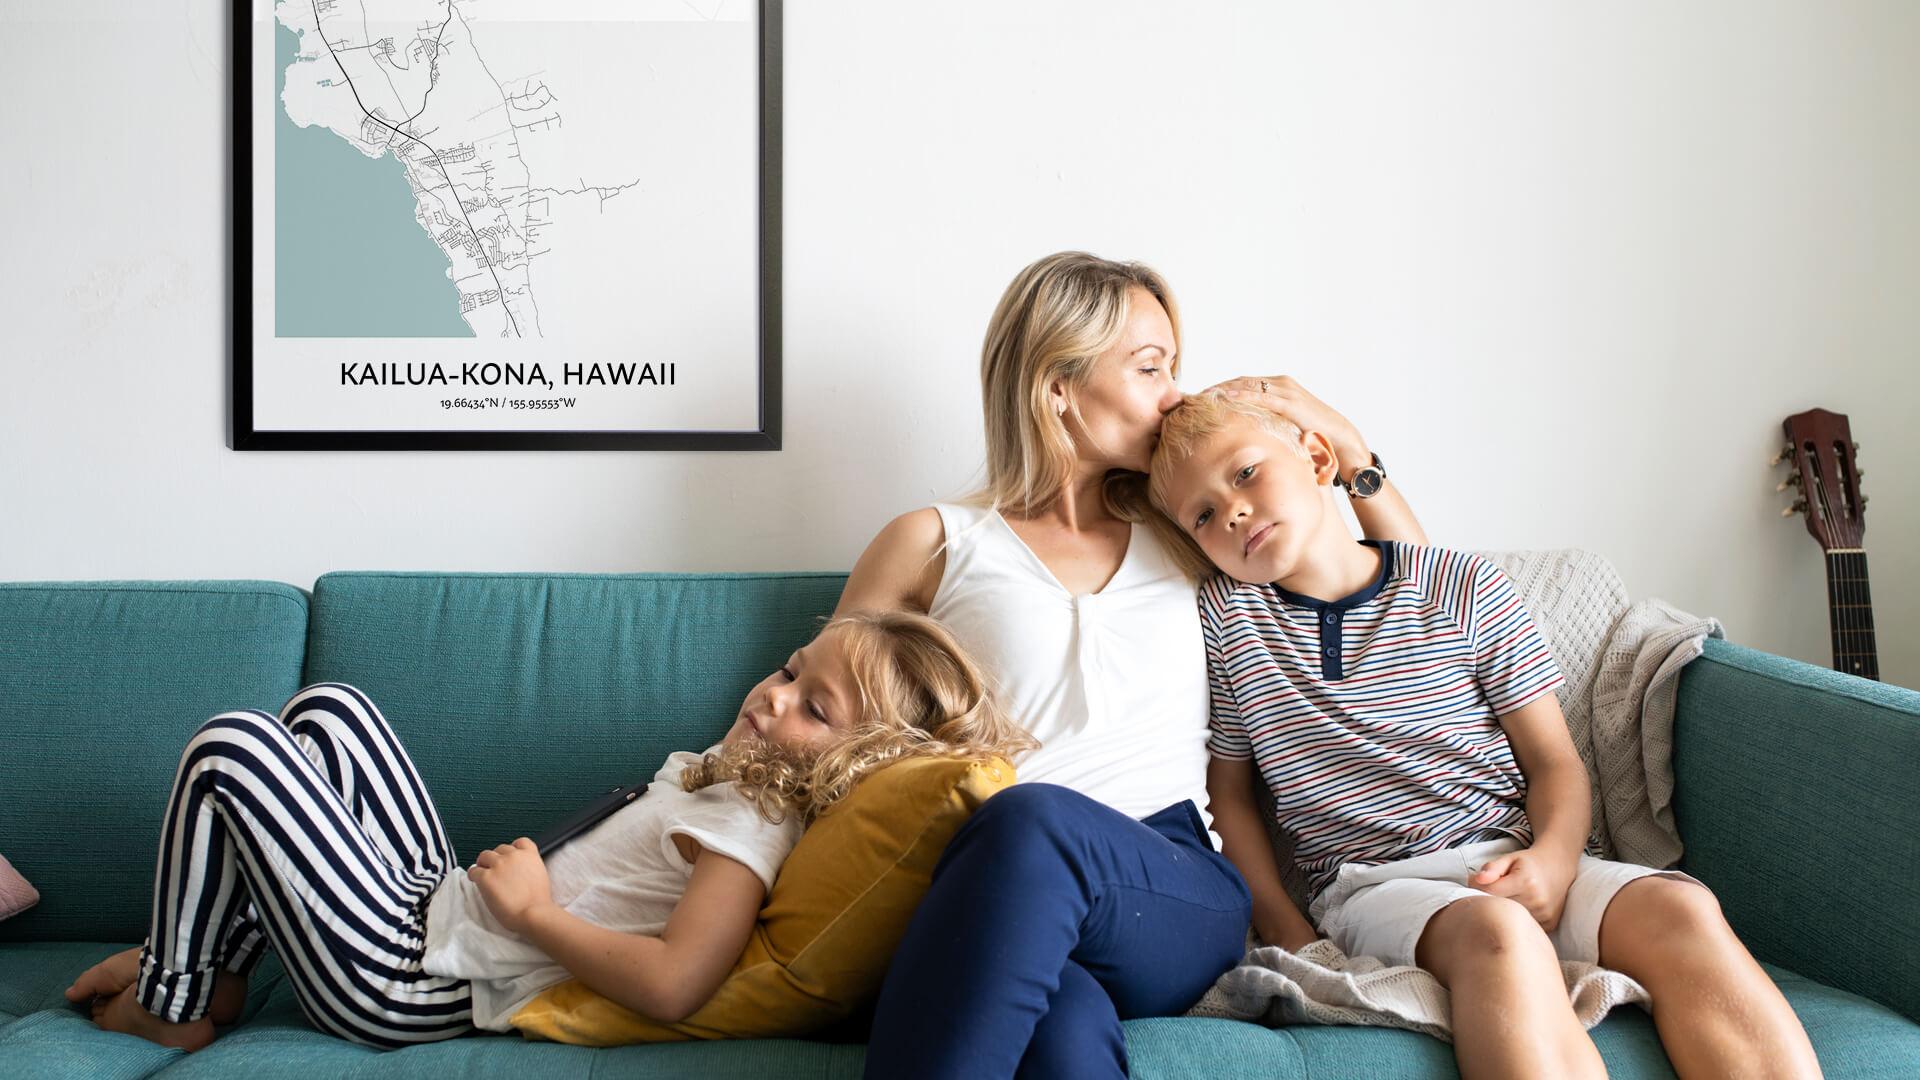 Kailua-Kona map poster